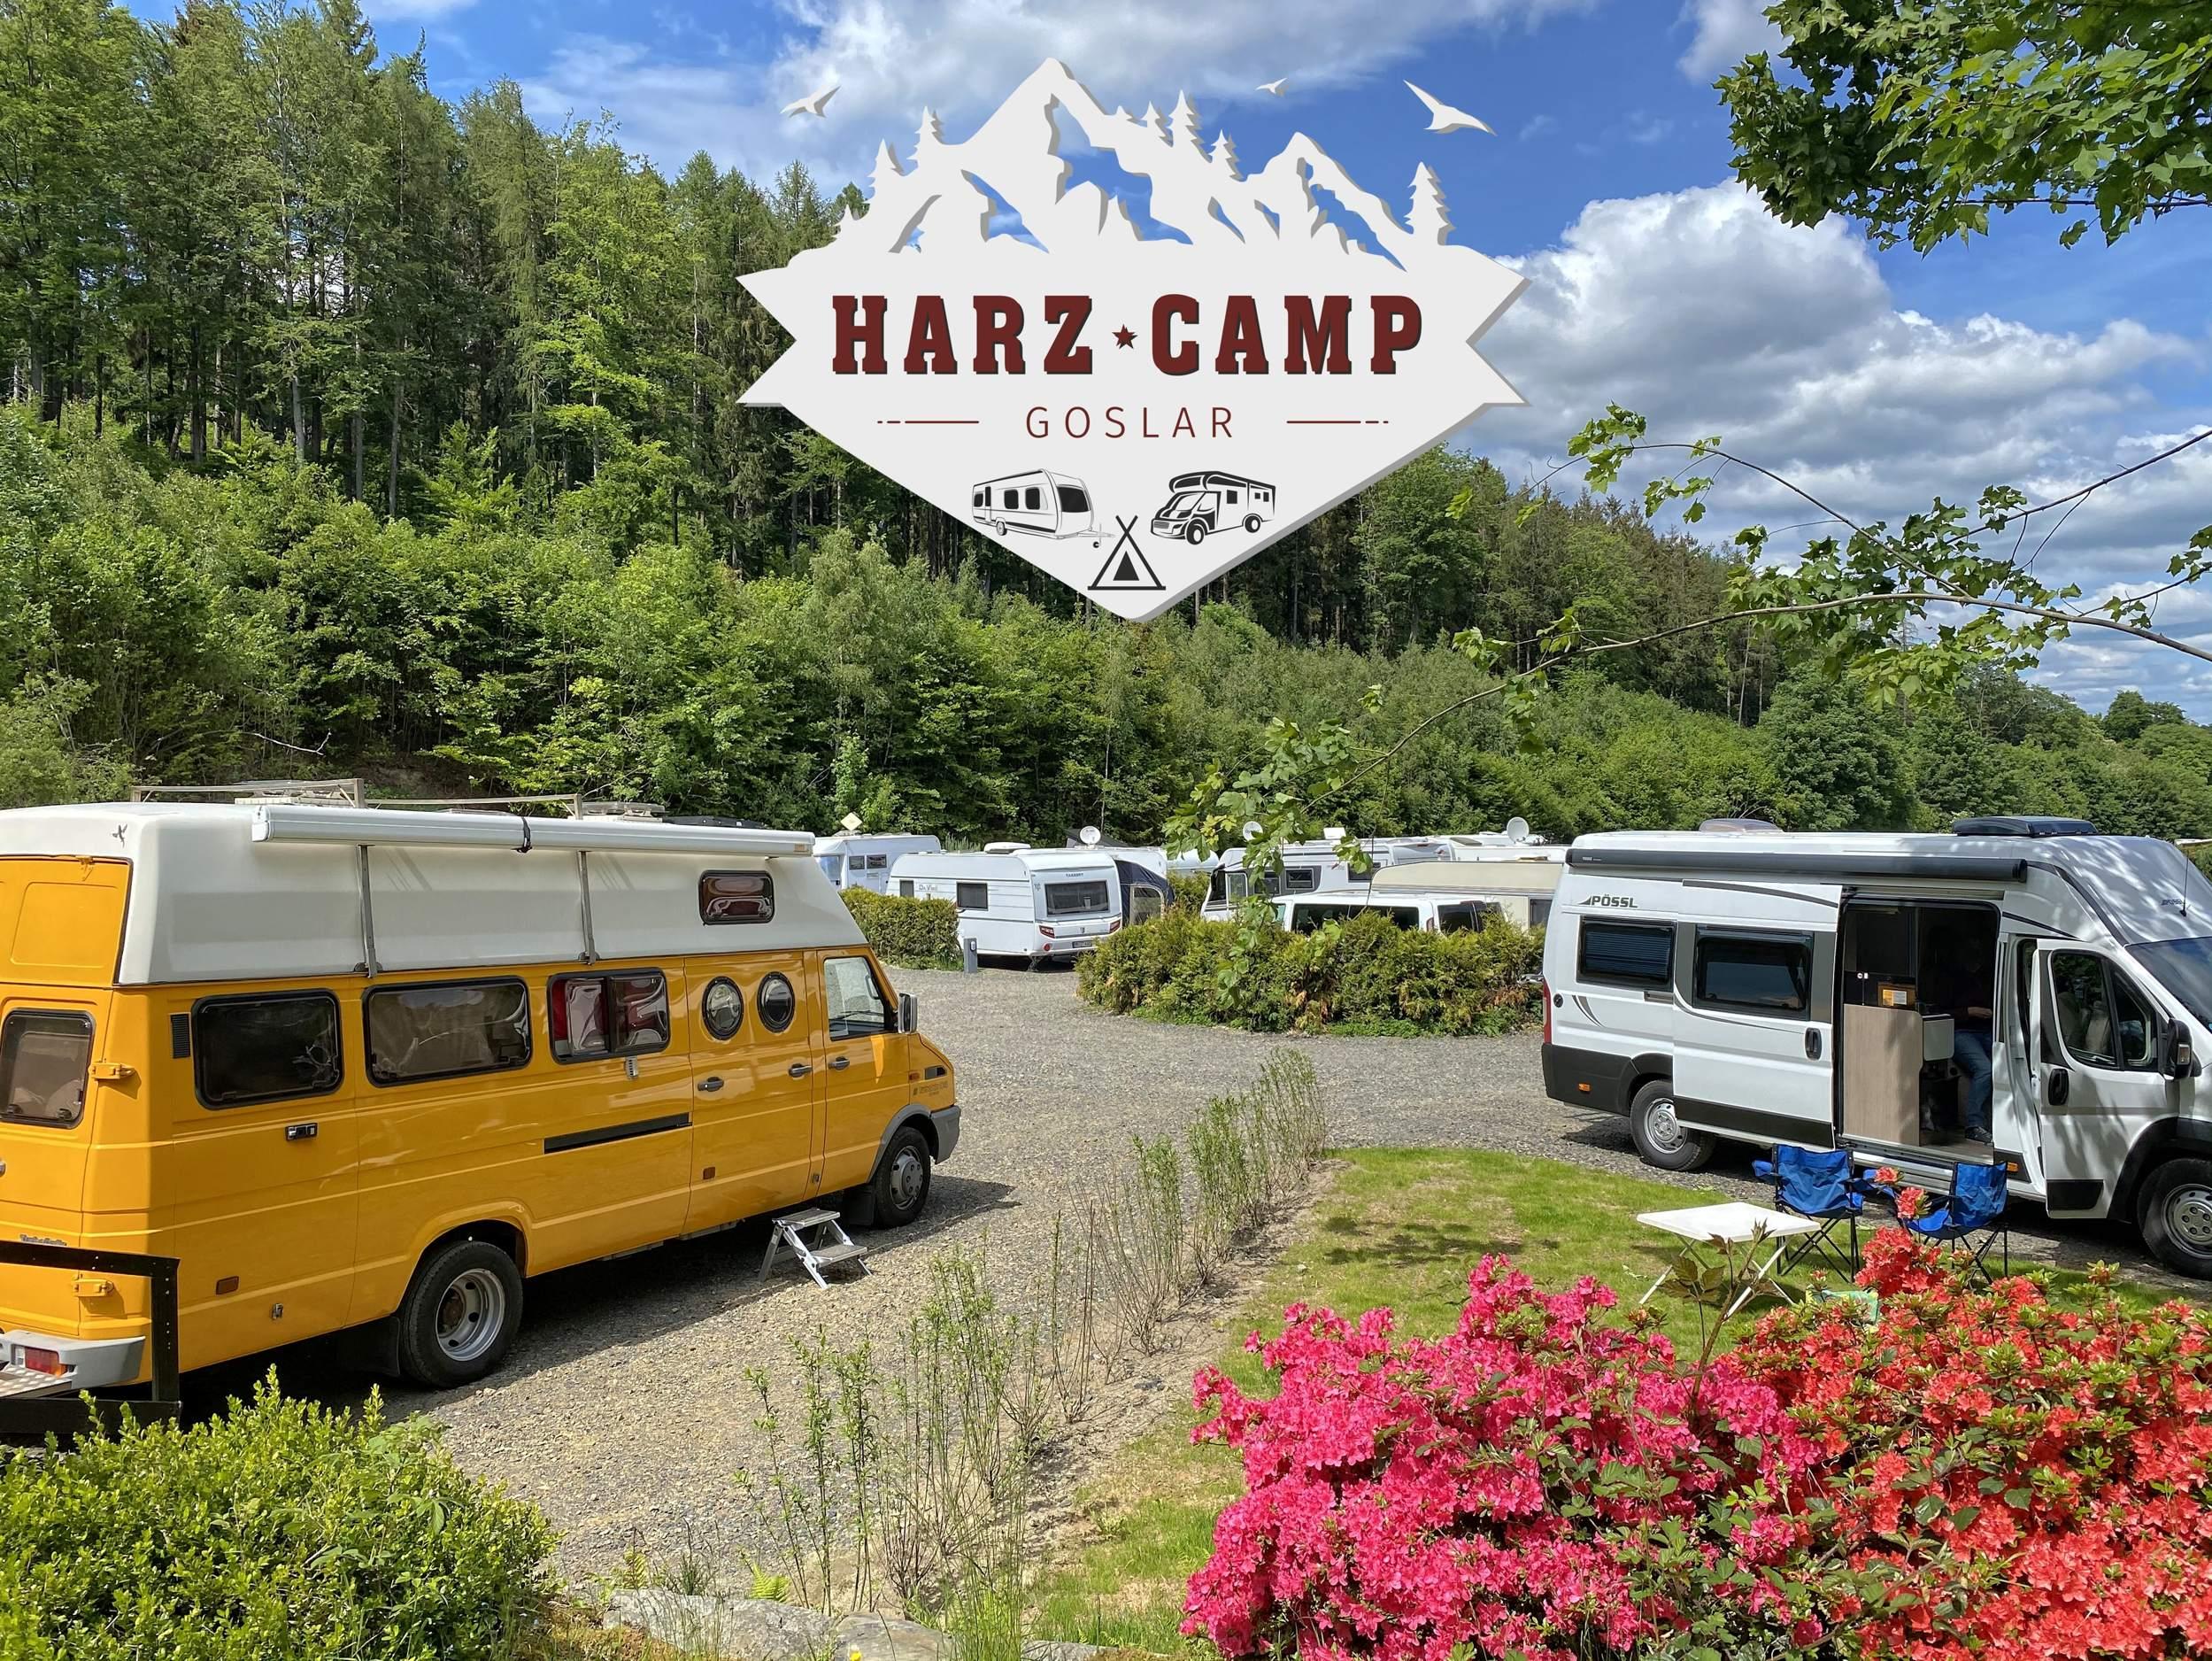 Harz Camp Goslar - Campingplatz